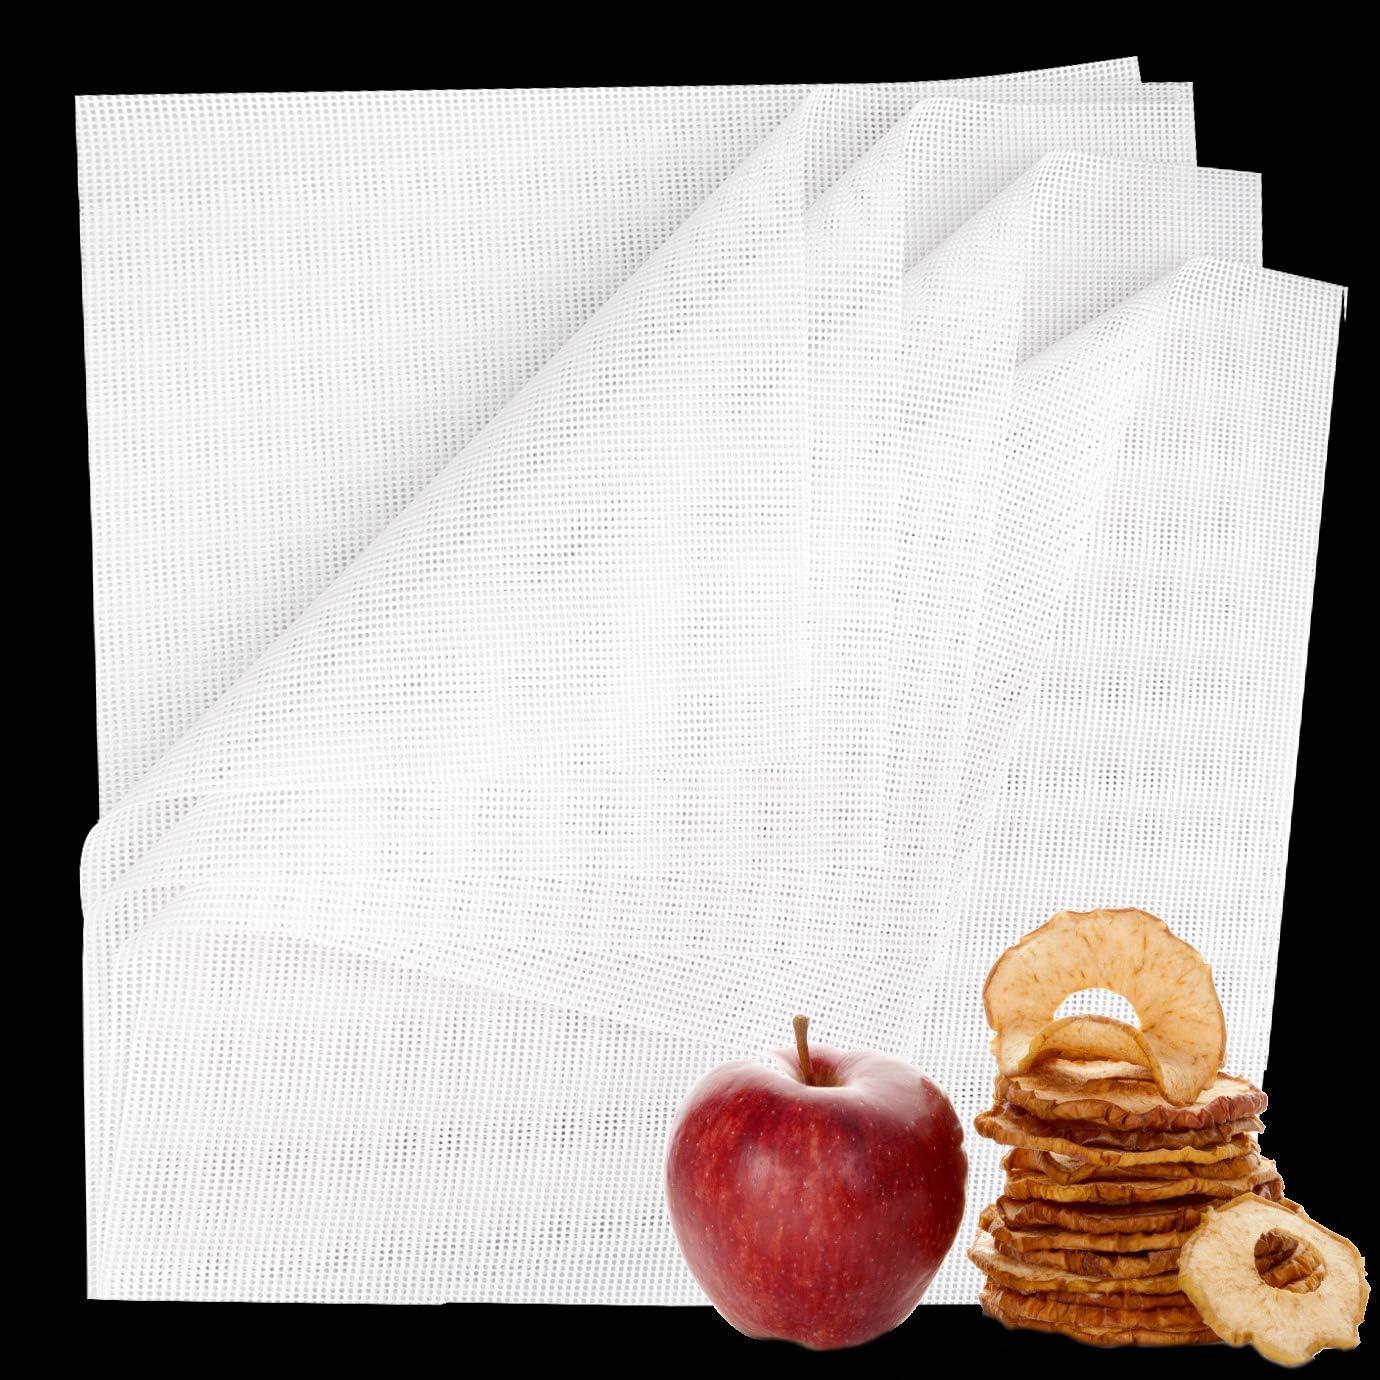 WXJ13 6 PCS Dehydrator Sheets, 14 x14 Inch Non-Stick Silicone Dehydration Sheet for Fruit Dryer Baking Mat, Reusable